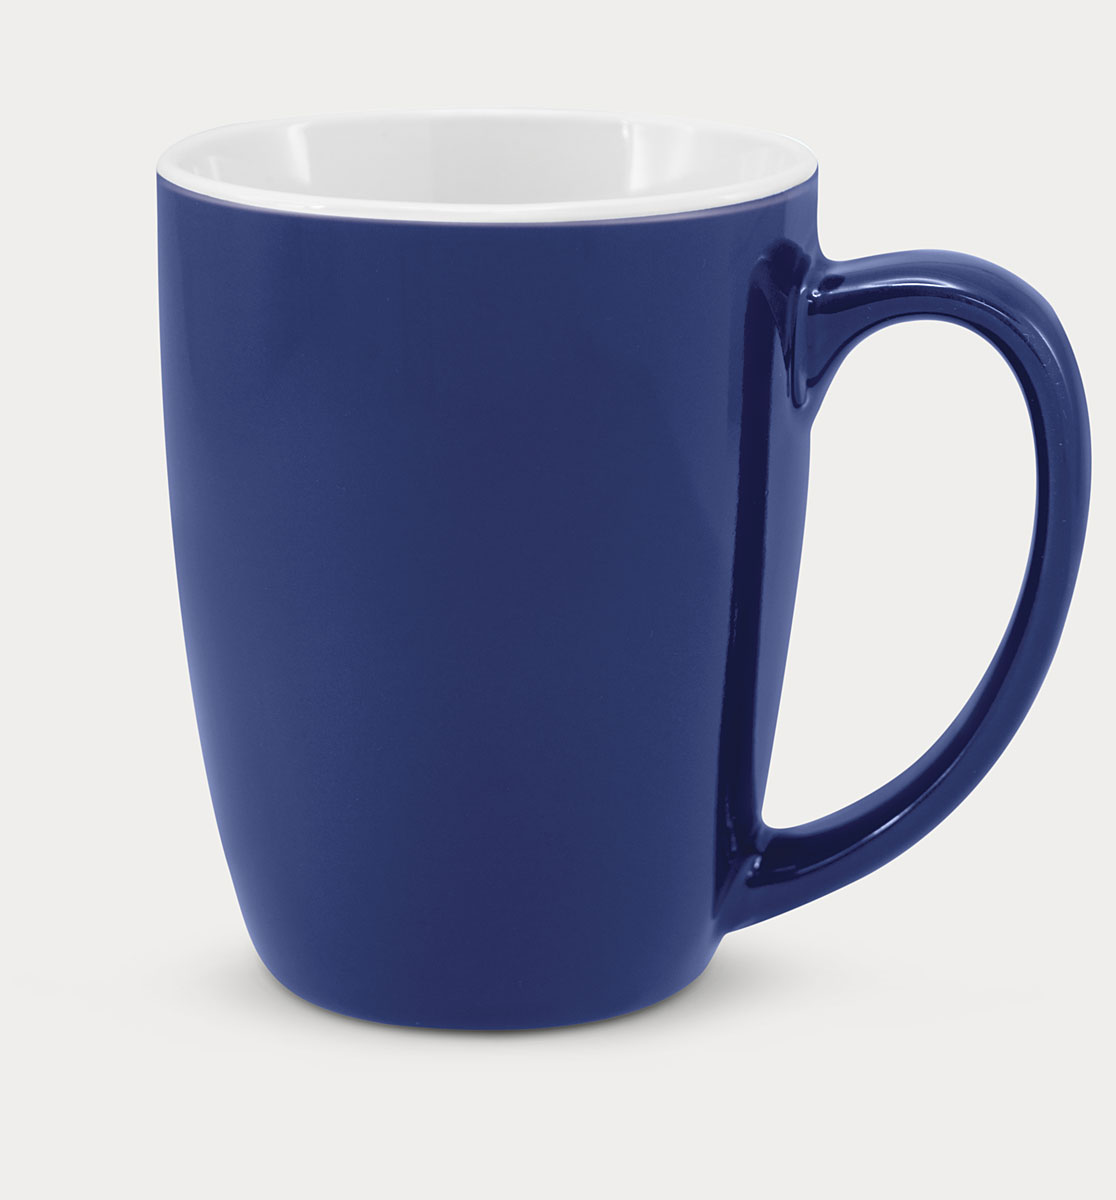 sorrento coffee mug primoproducts. Black Bedroom Furniture Sets. Home Design Ideas